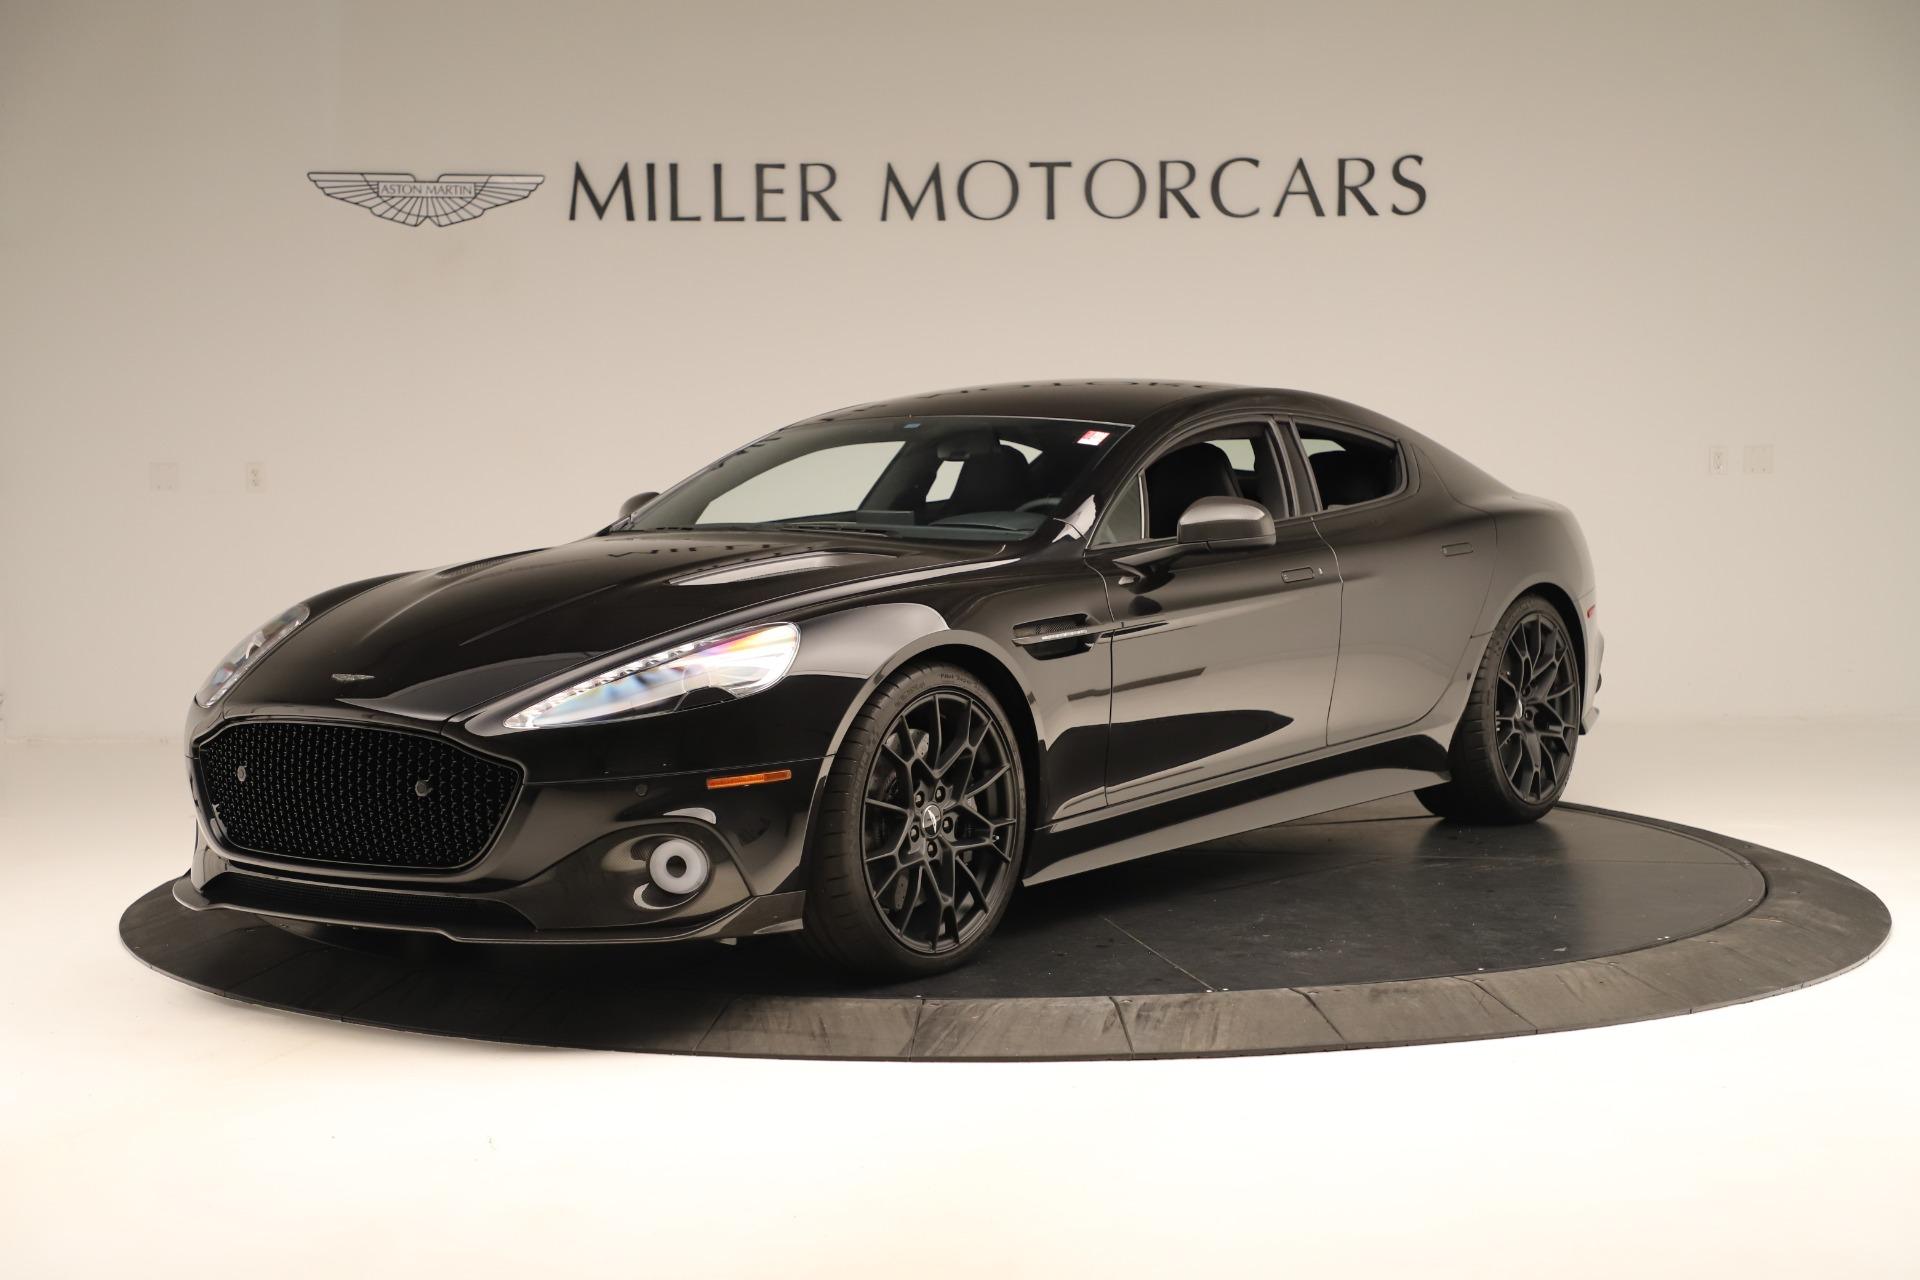 2019 Aston Martin Rapide V12 Amr Miller Motorcars United States For Sale On Luxurypulse